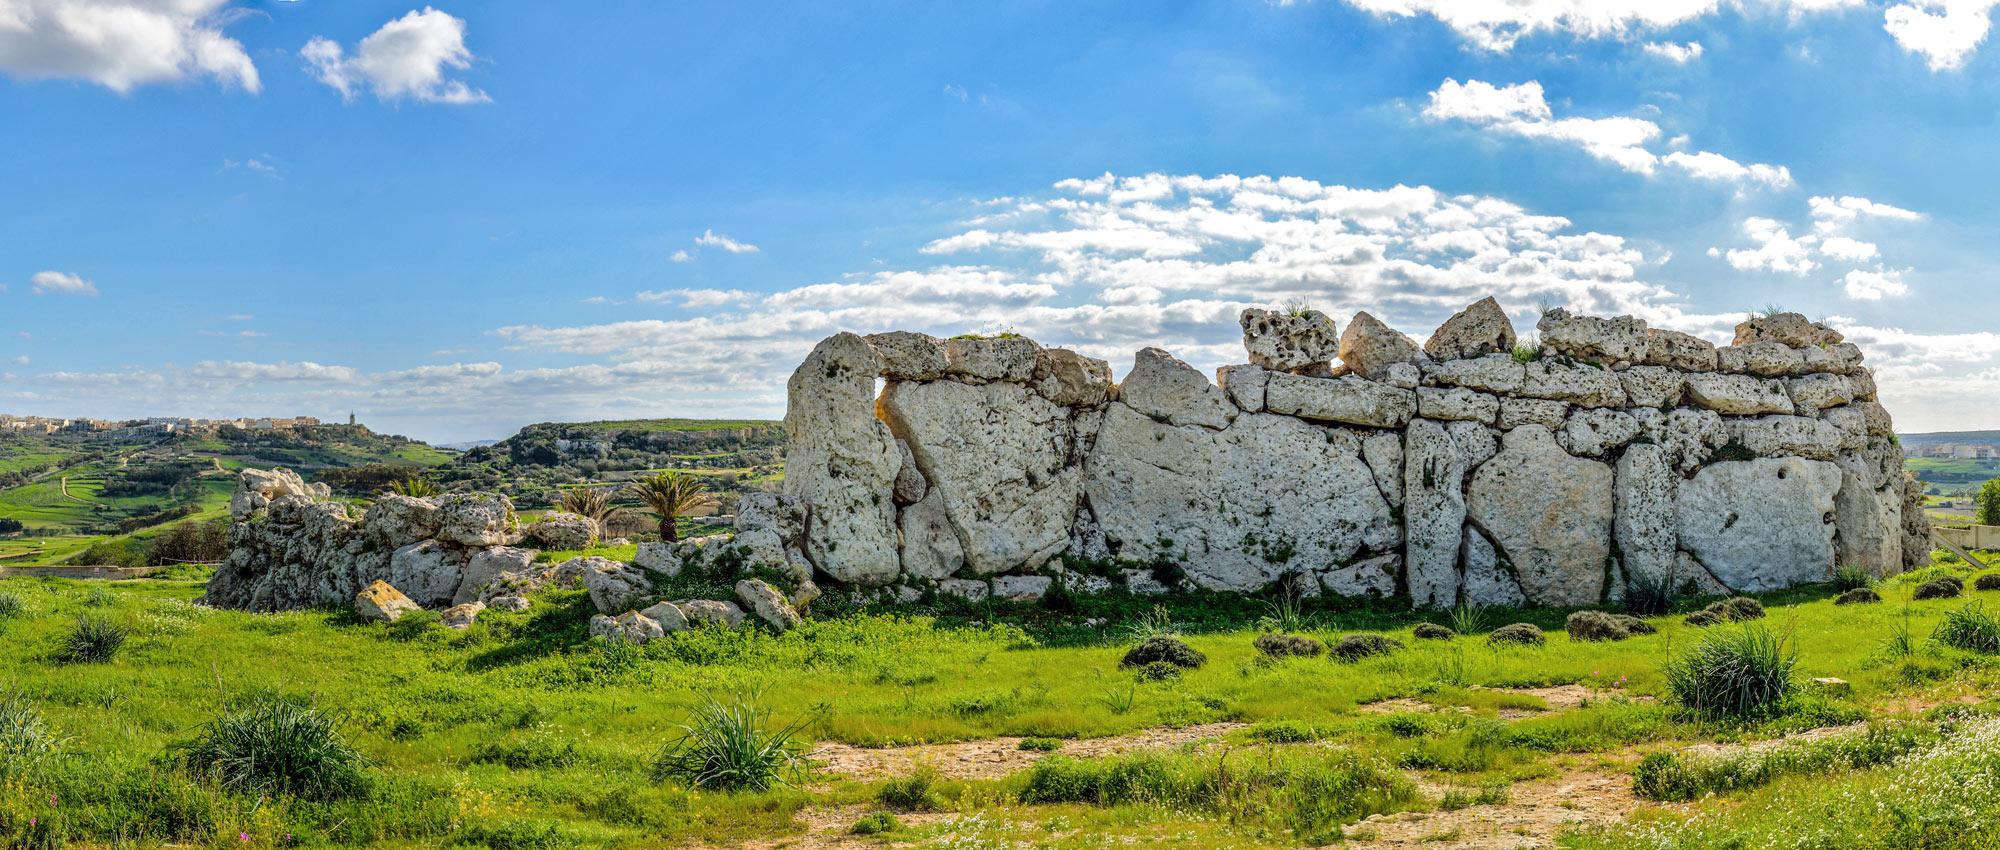 Ġgantija Besucherzentrum, Gozo